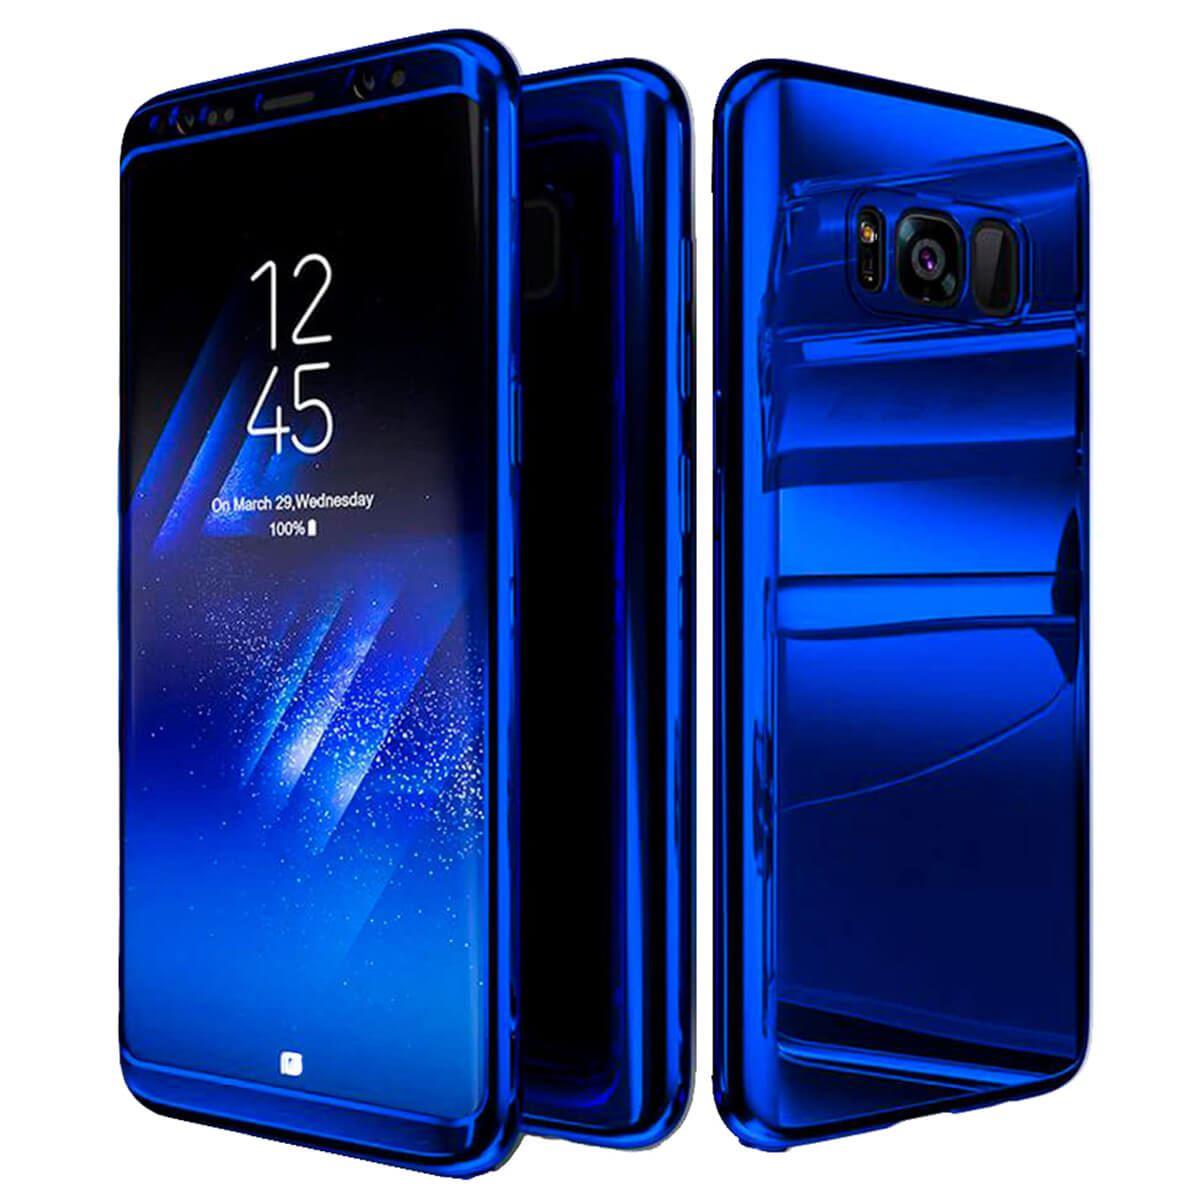 Shockproof-Hard-Case-Samsung-Galaxy-S7-edge-S8-Plus-Hybrid-360-Ultra-Thin-Mirror thumbnail 7